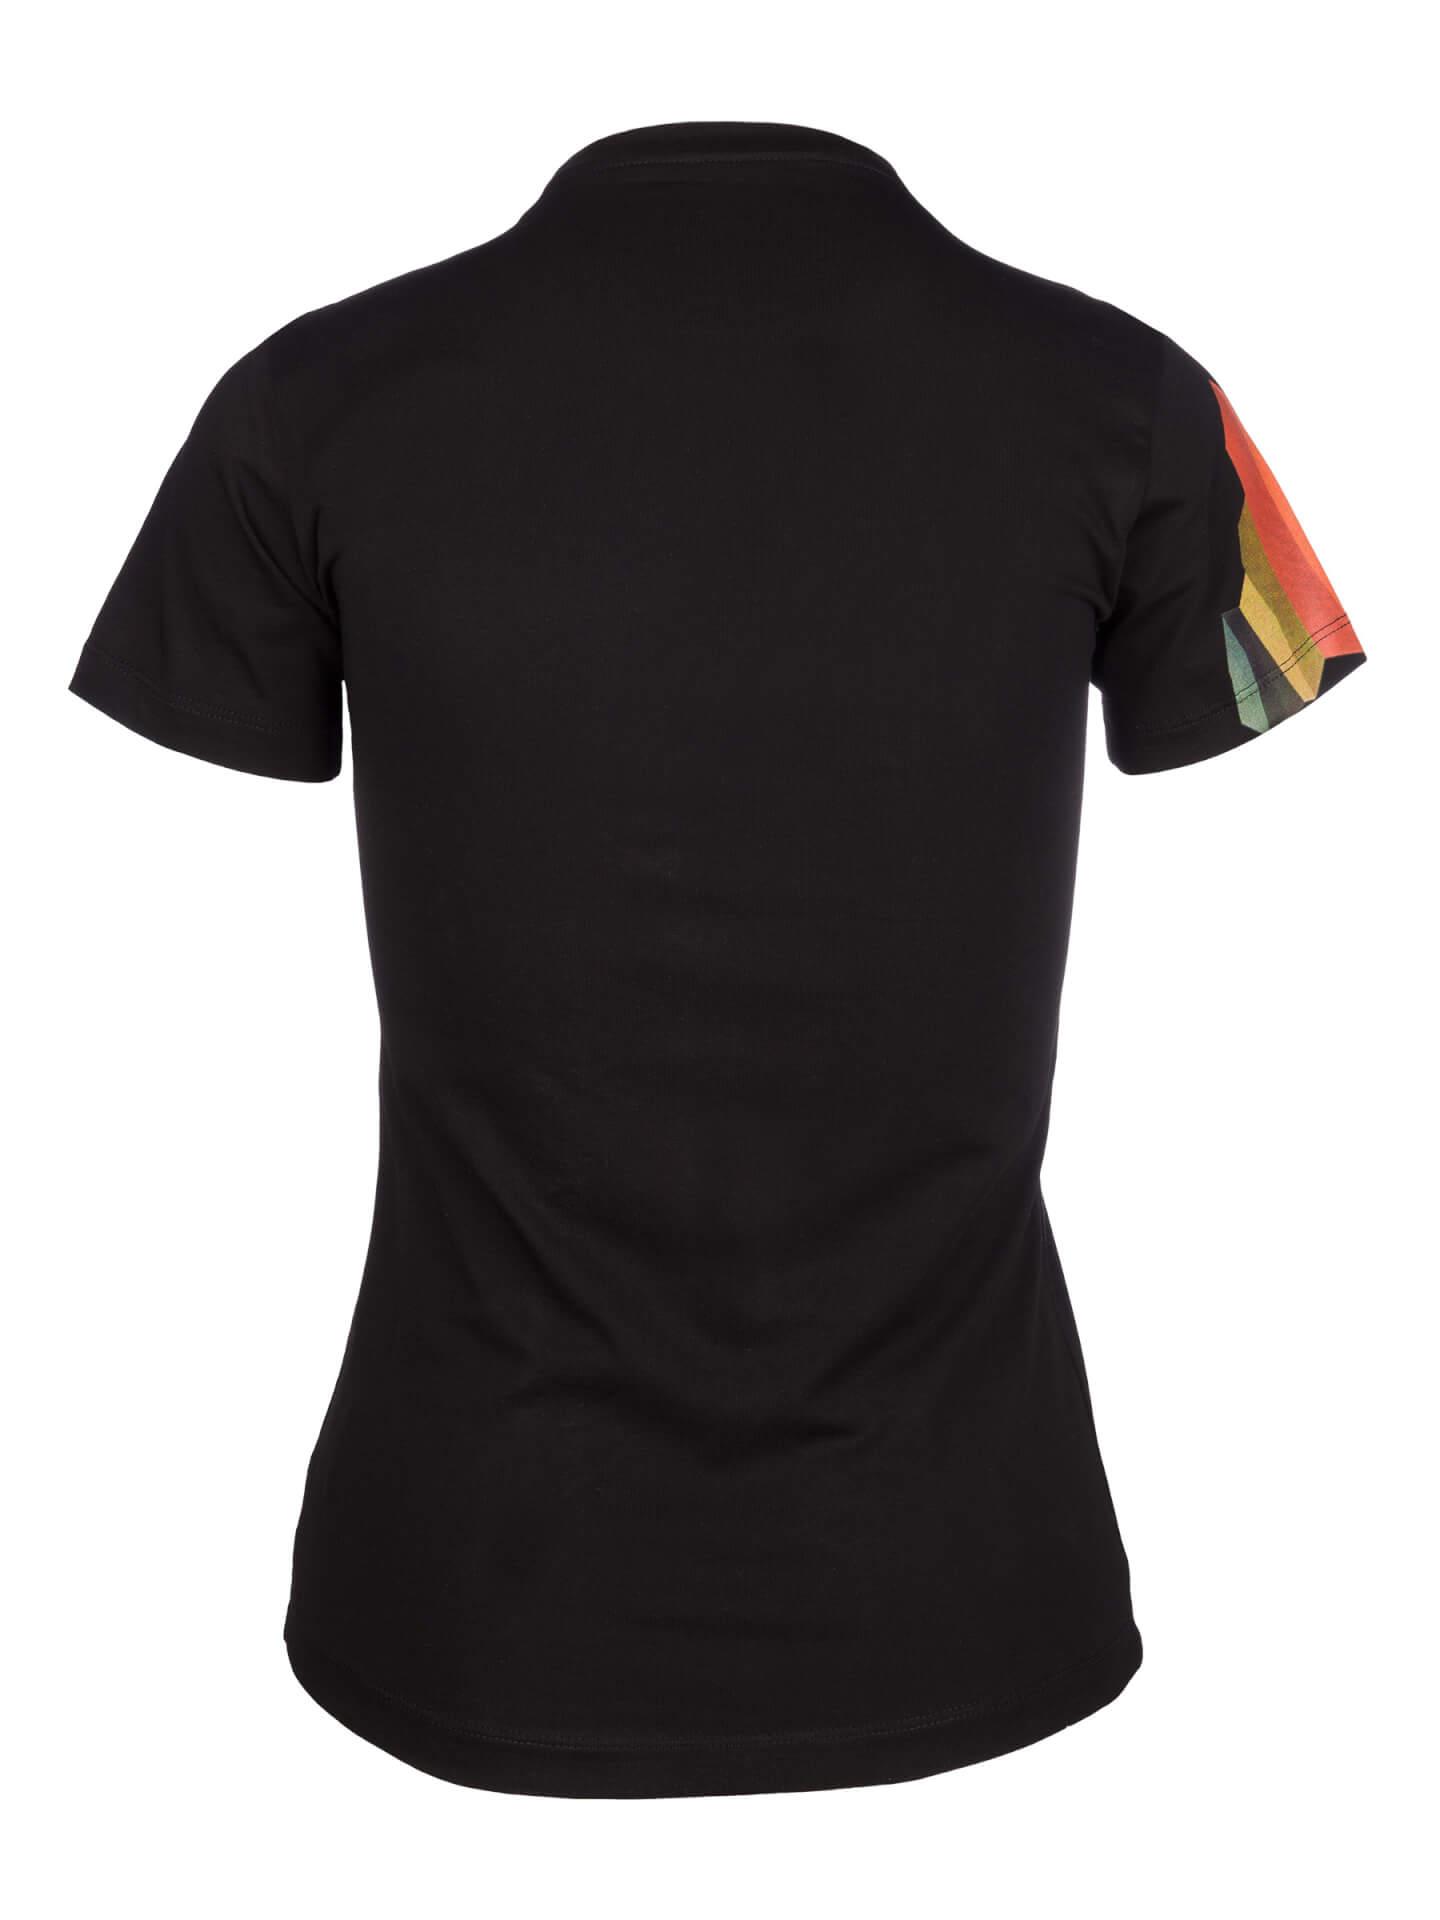 T-shirt Donna Veloce Club Q36.5